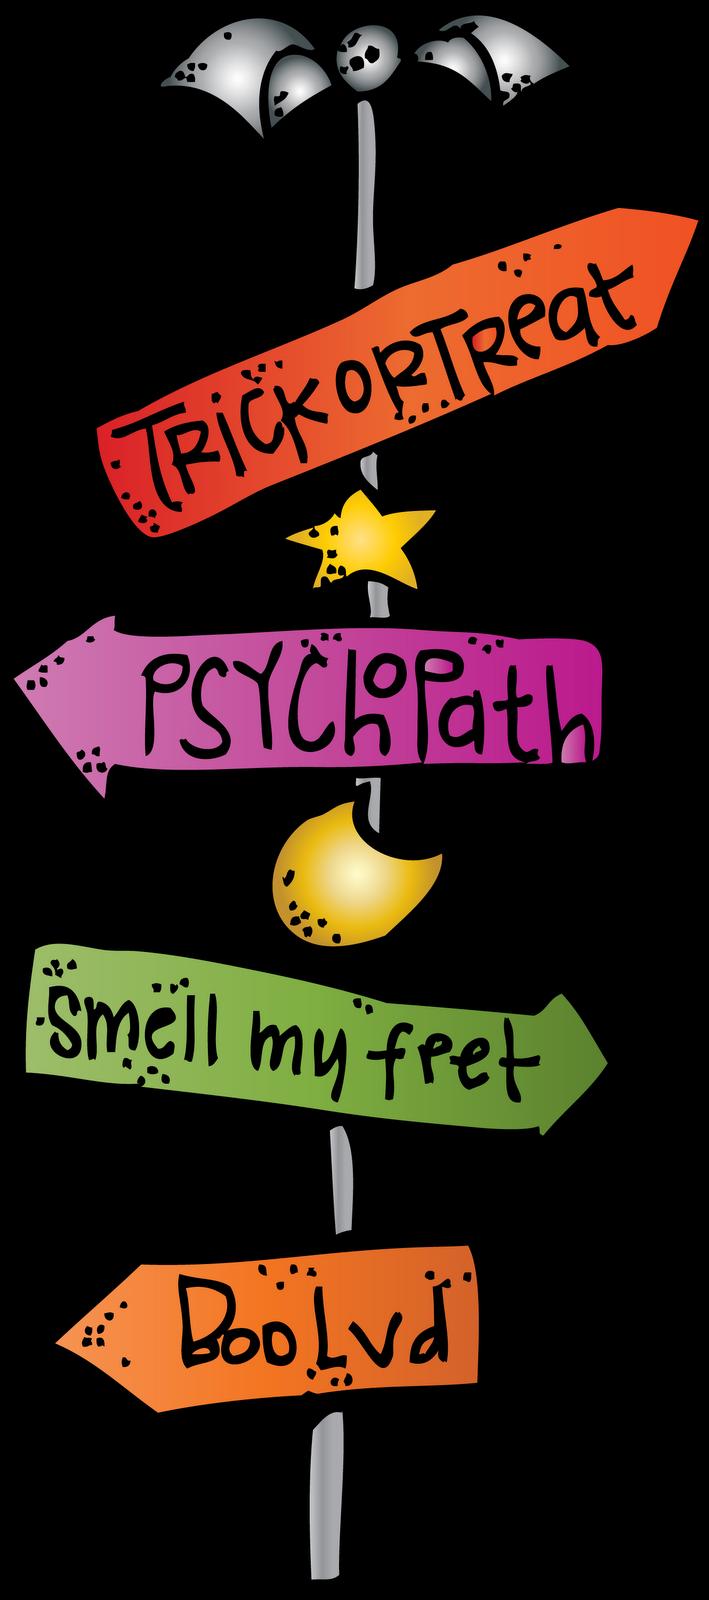 Spelling clipart word october, Spelling word october